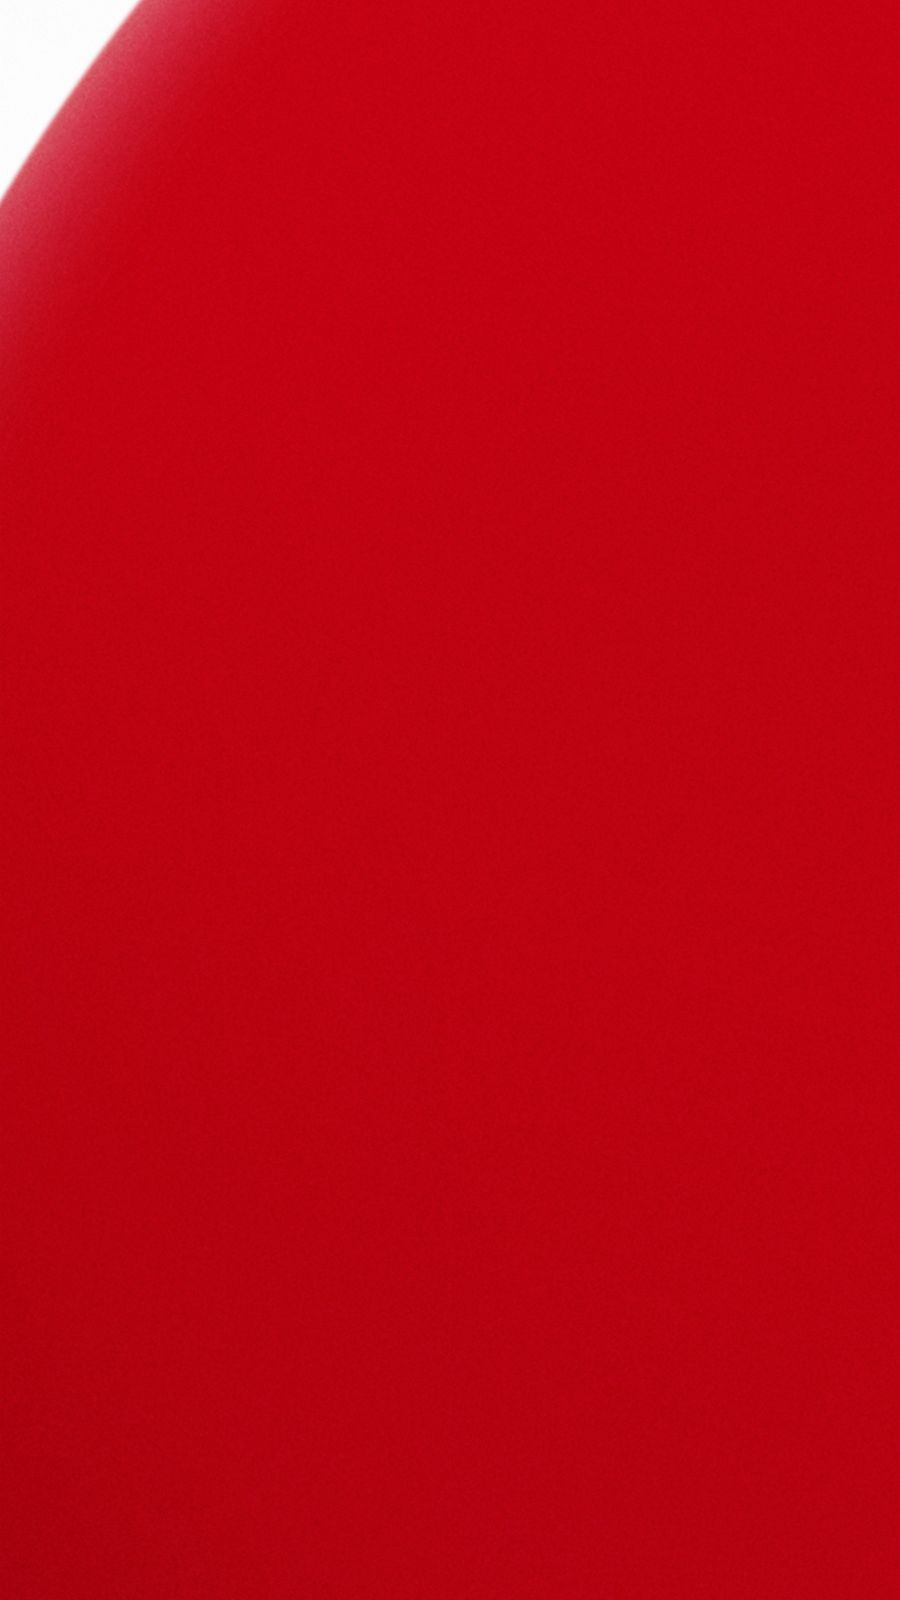 Military red 300 Nail Polish - Military Red No.300 - Image 2